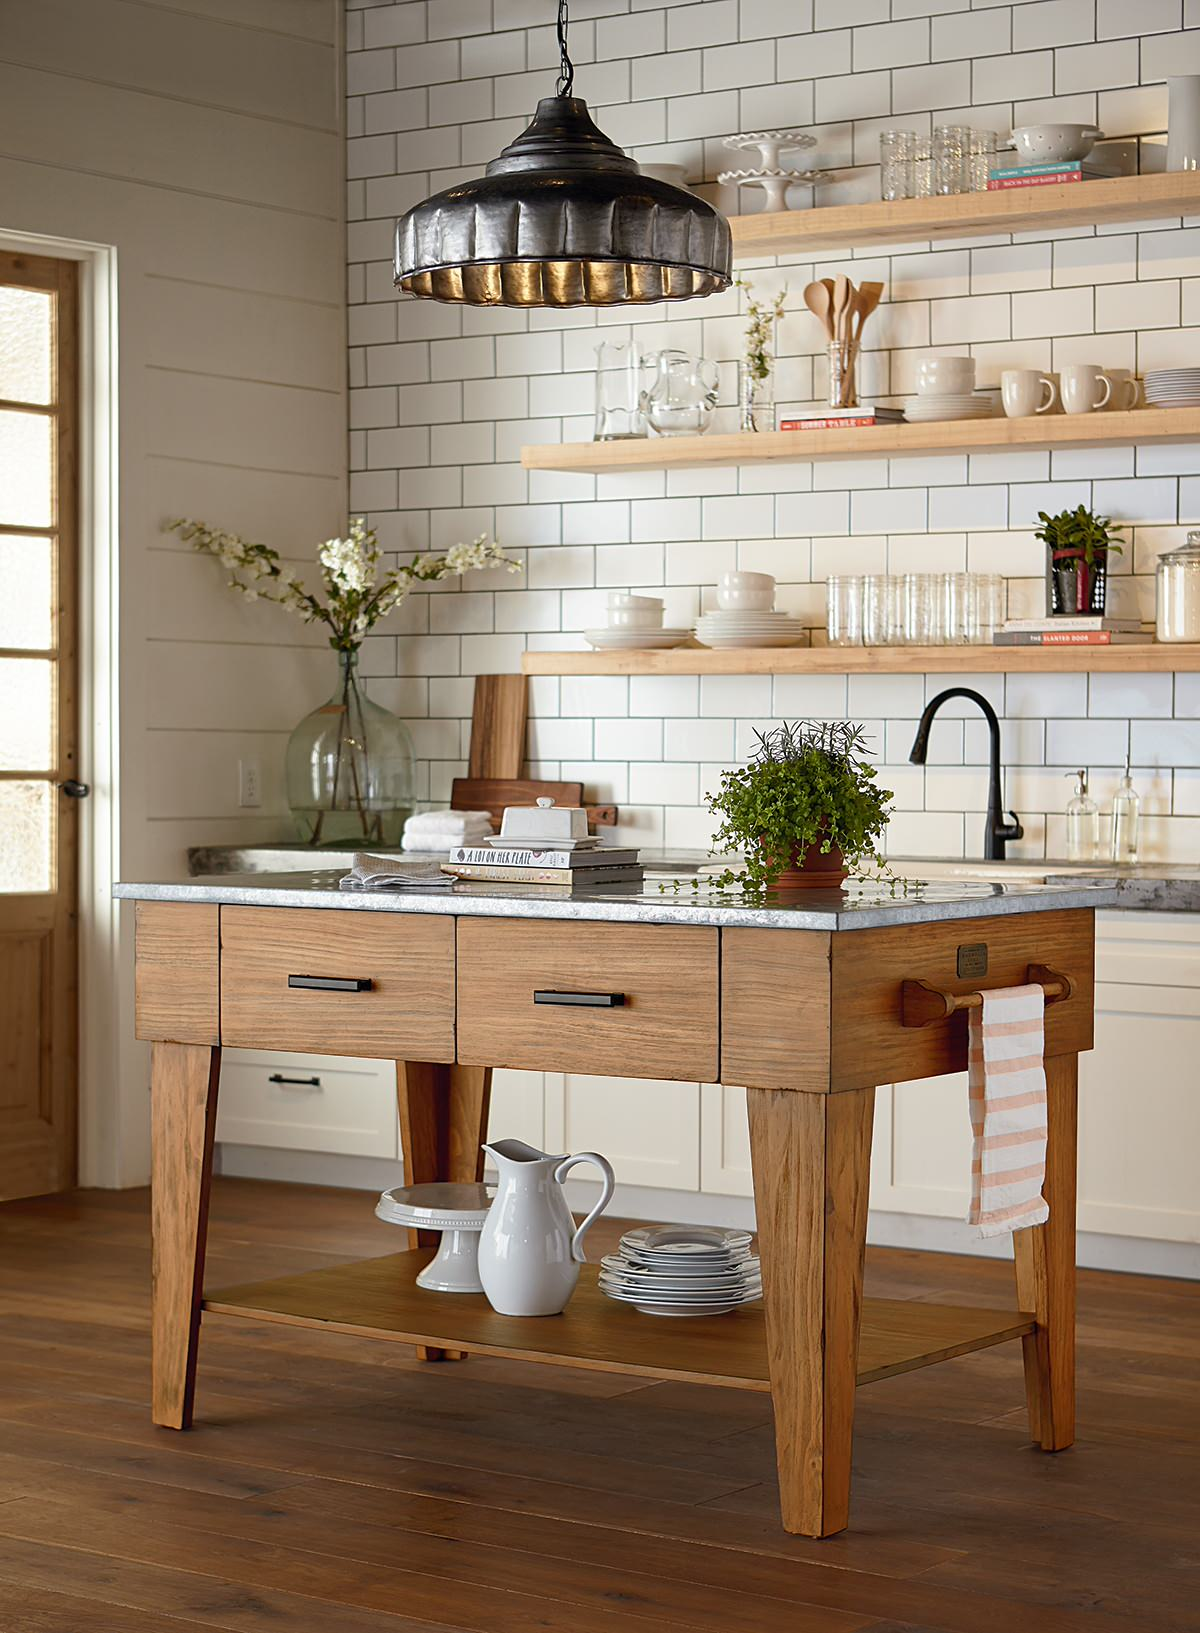 farmhouse sink and zinc countertops